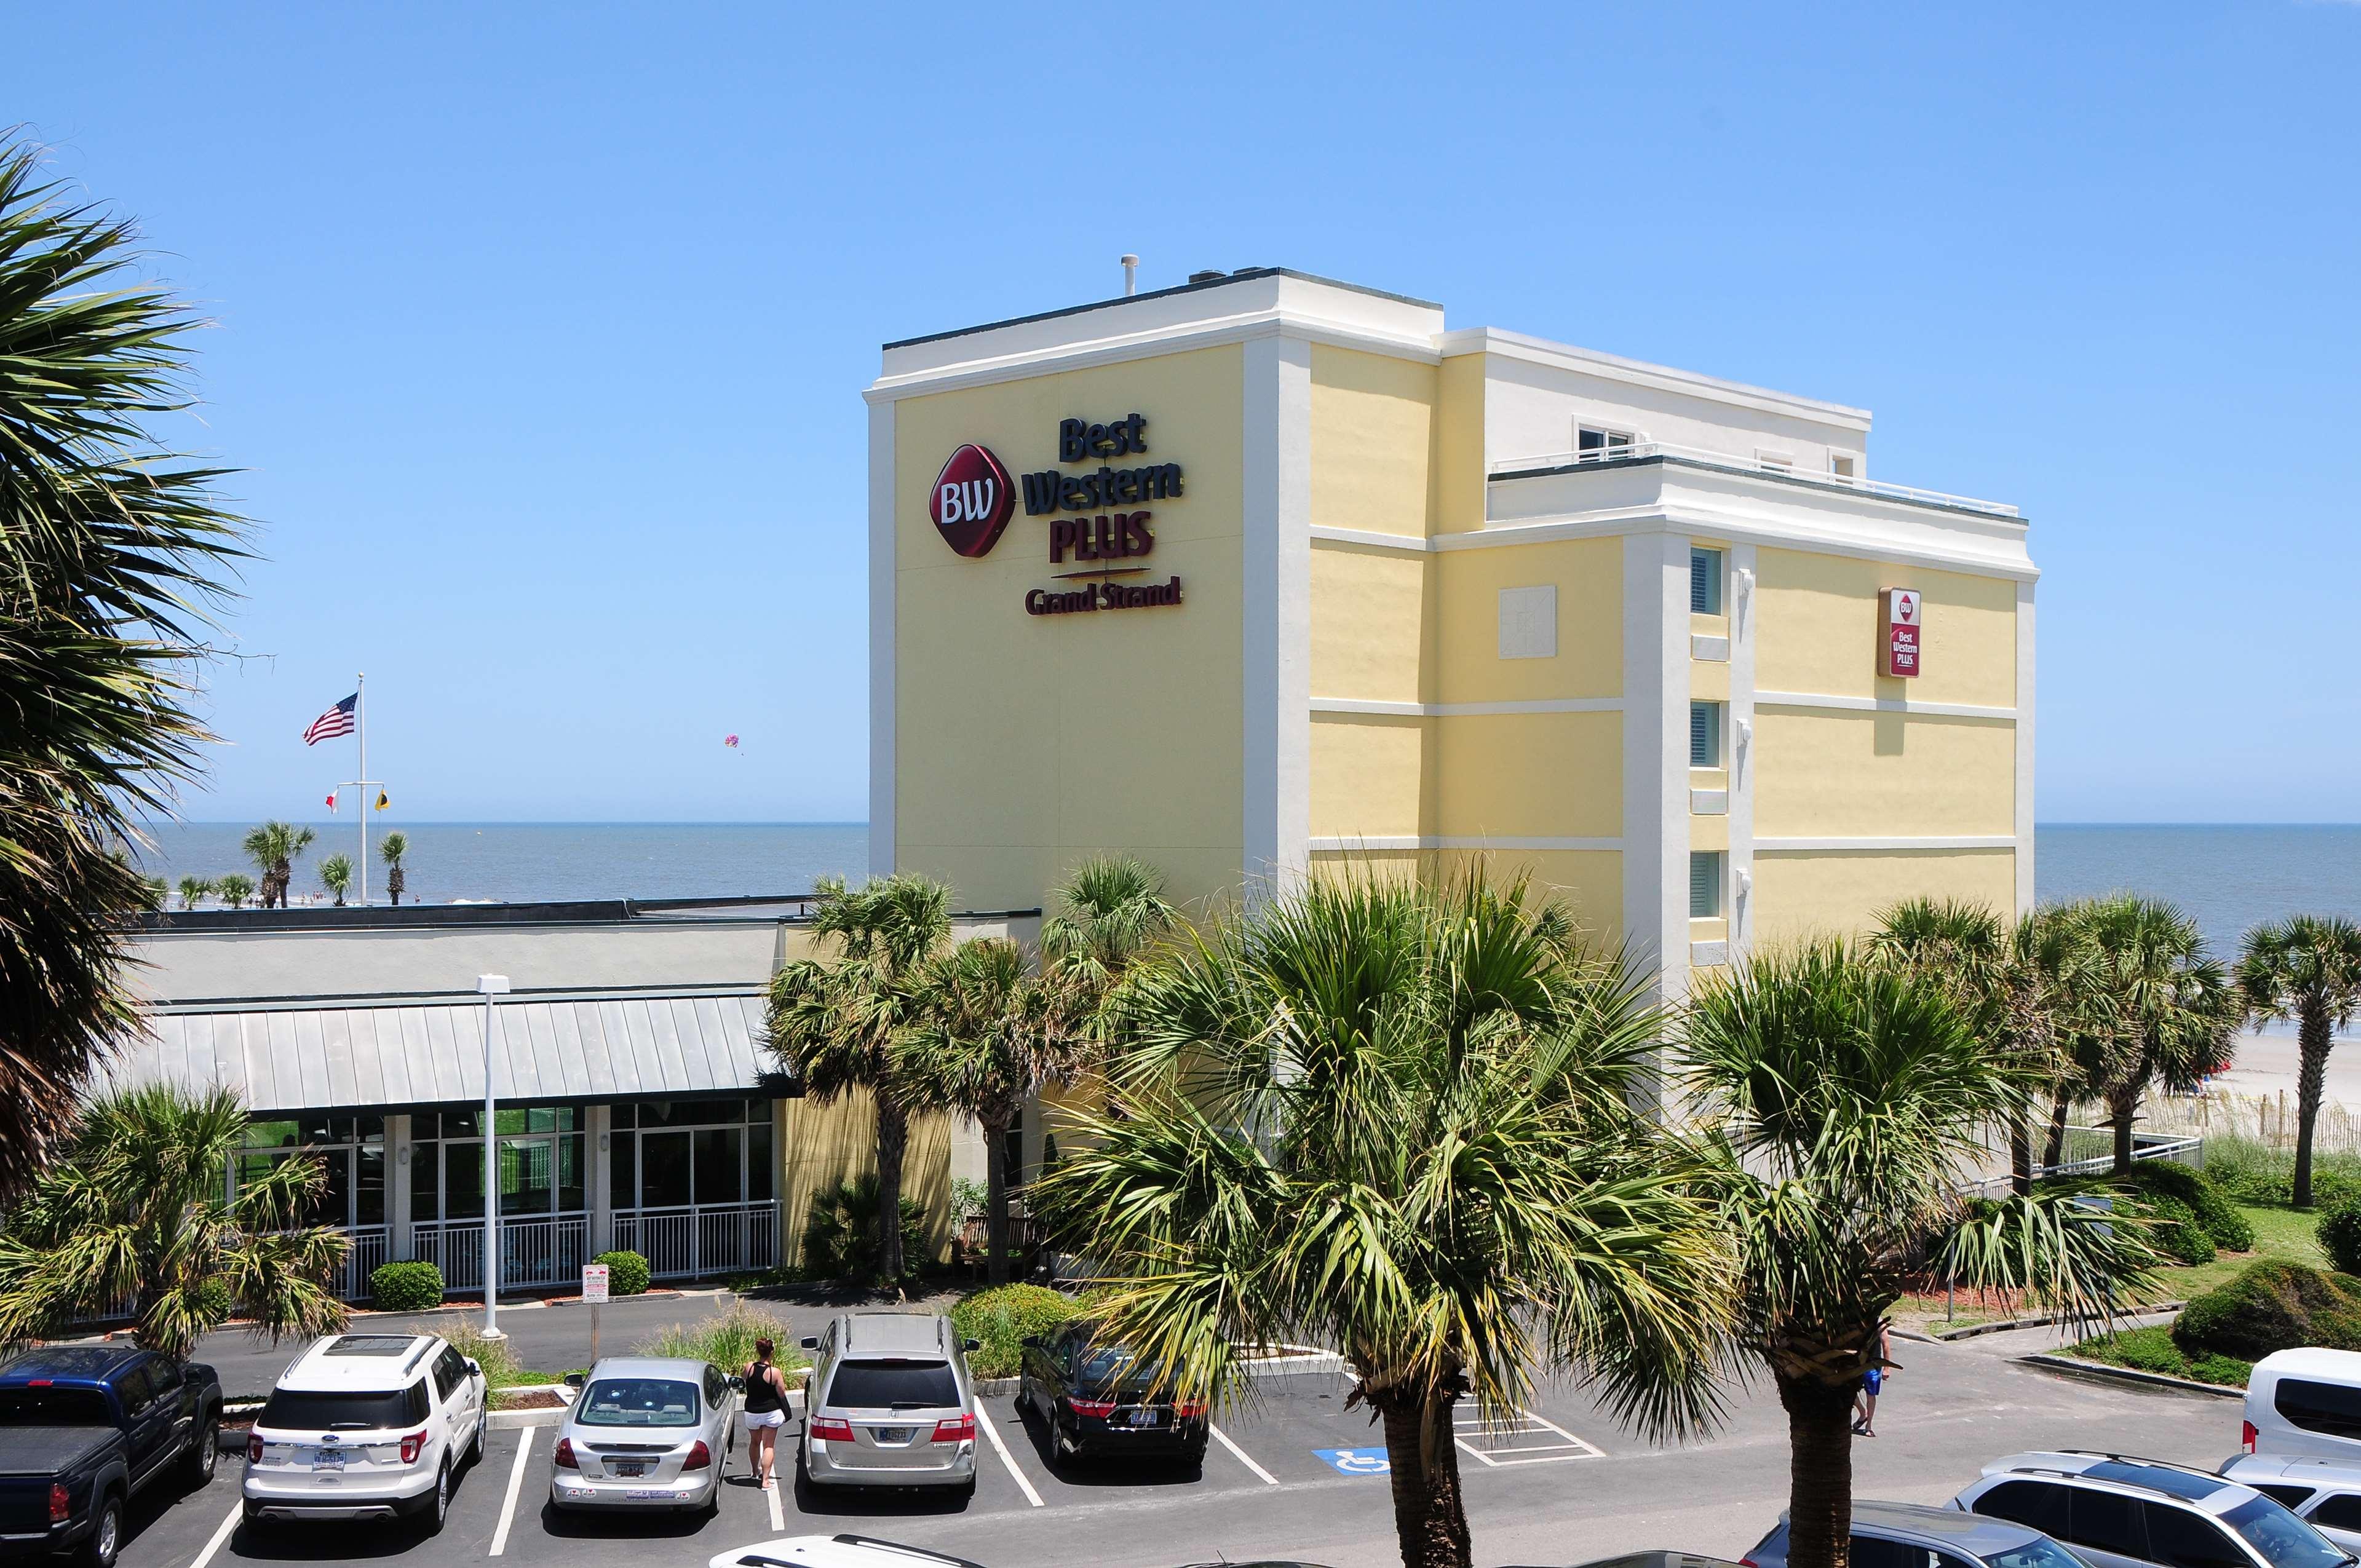 Pizza Hut Express Myrtle Beach Sc